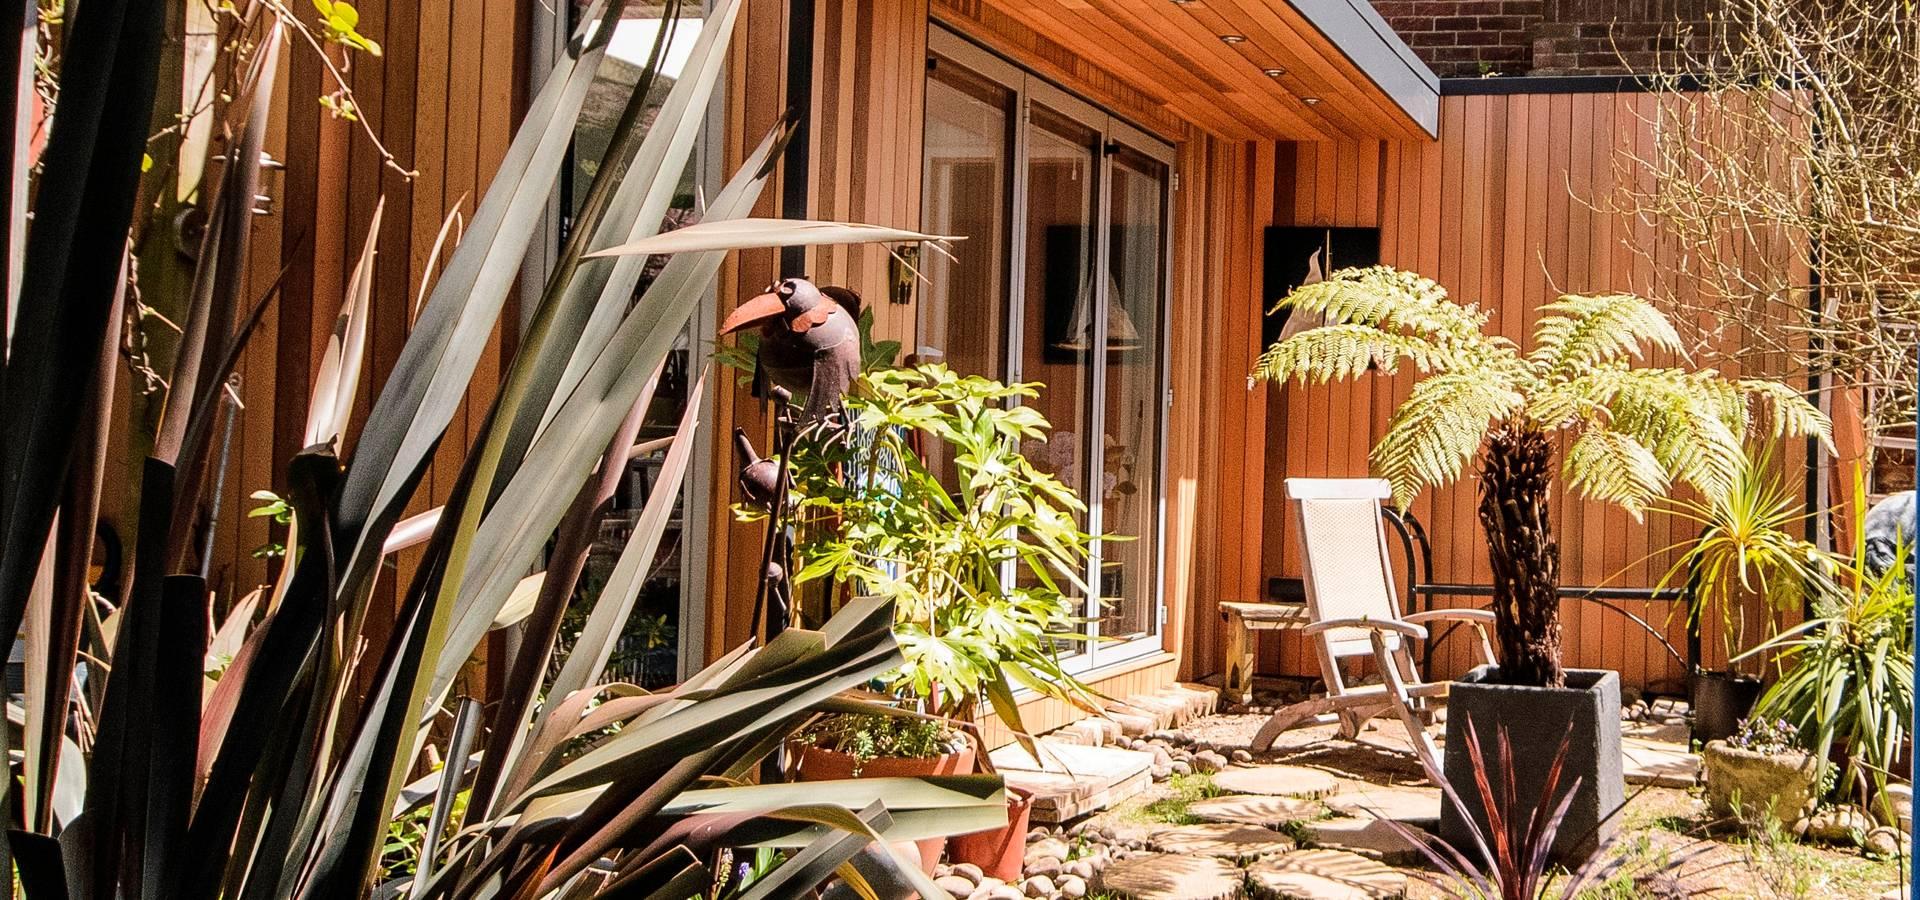 eDEN Garden Rooms Ltd